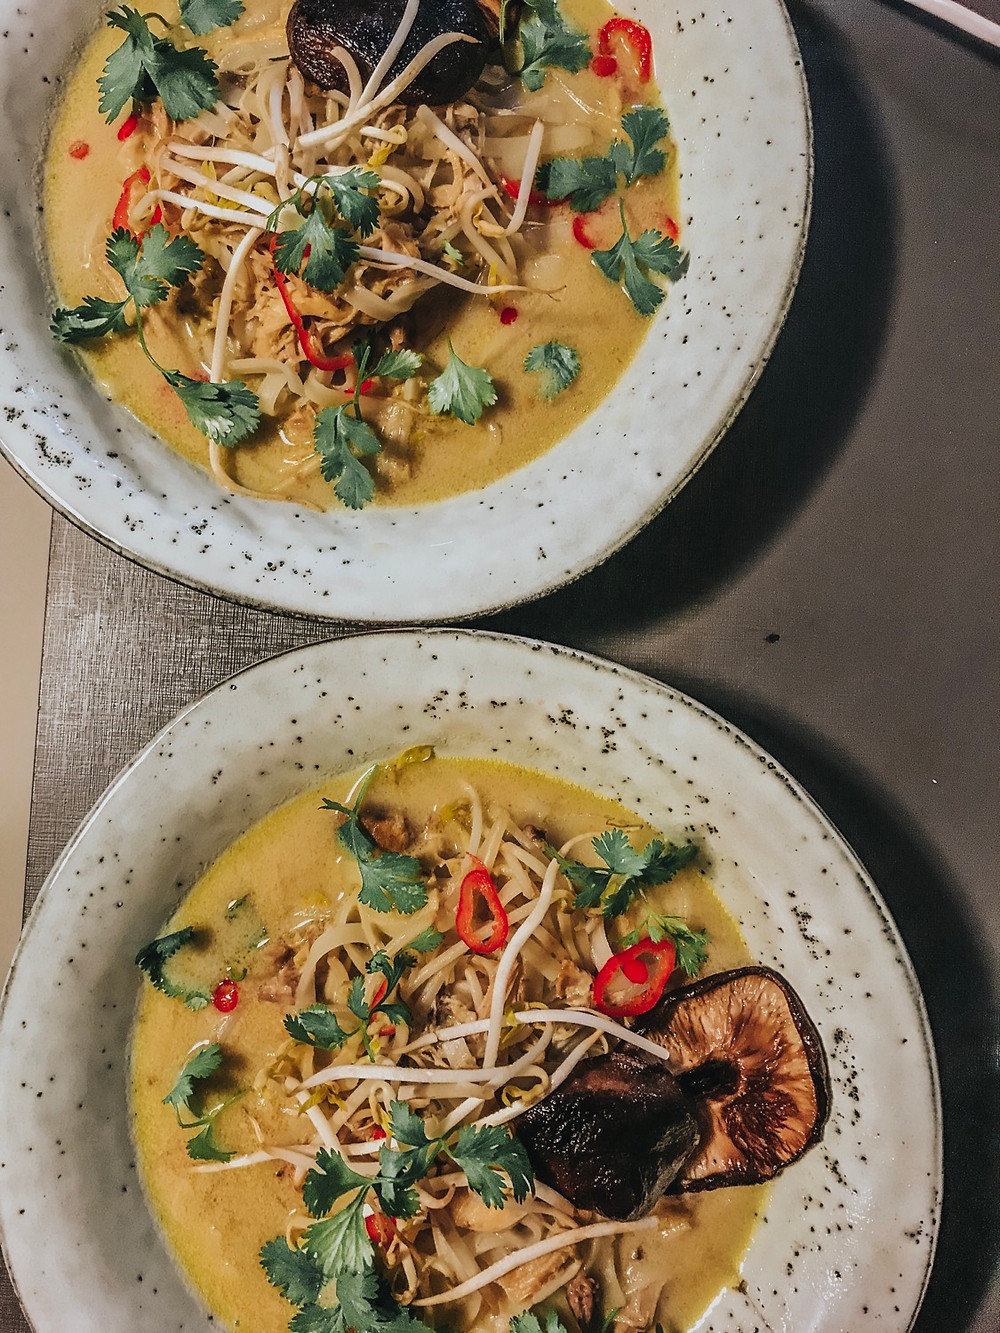 Receita de tom kha gai: sopa tailandesa de leite de coco e caldo de frango